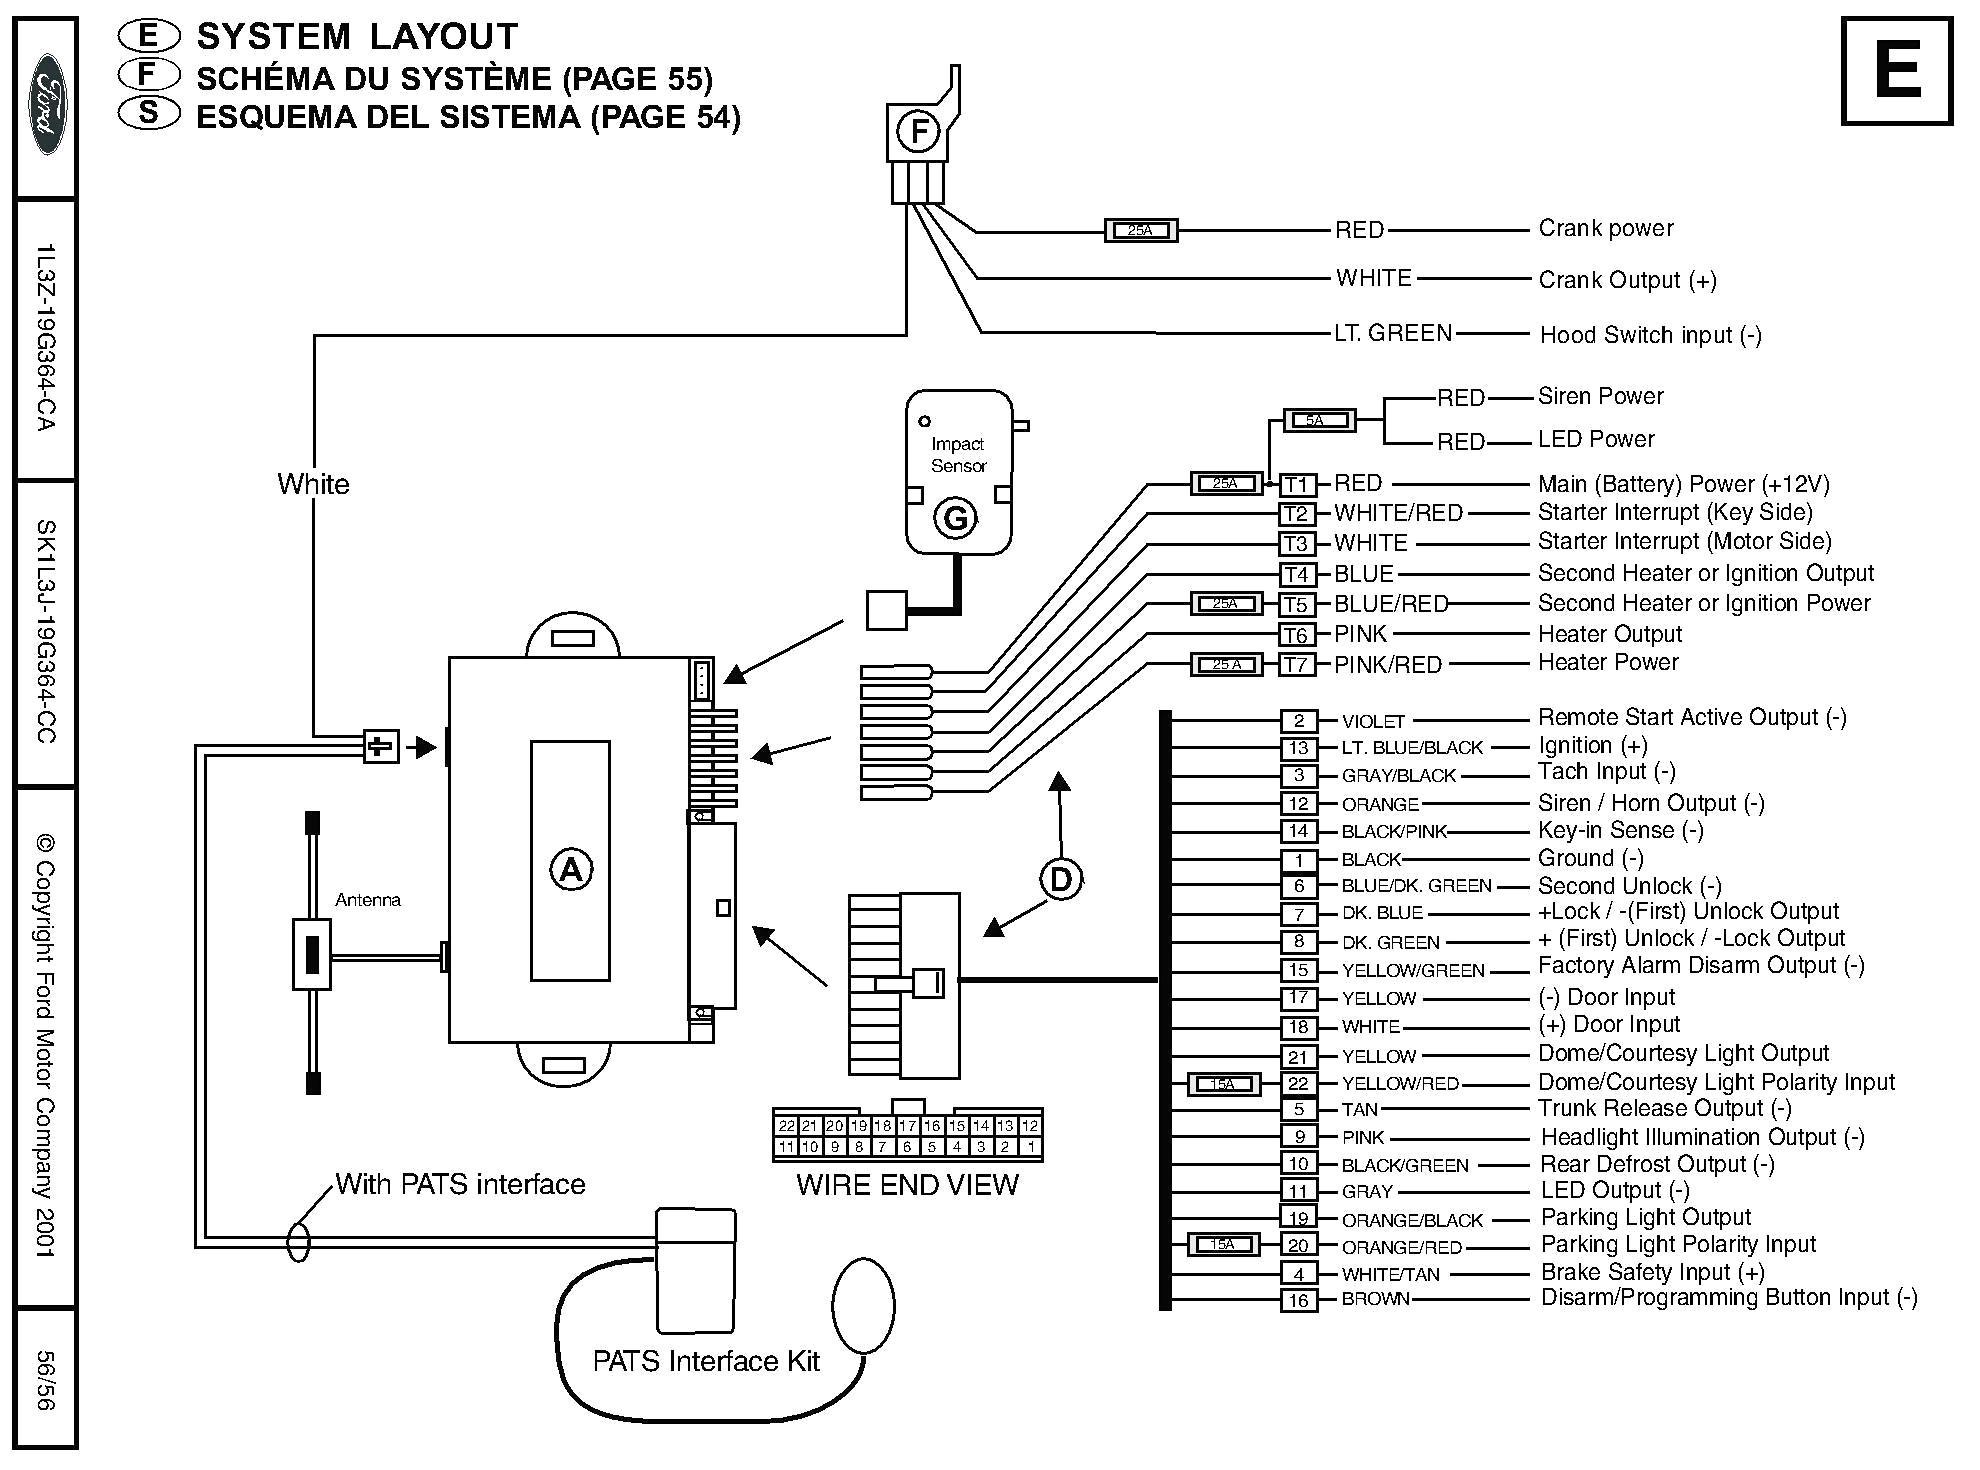 Car Ignition System Diagram Car Ignition System Wiring Diagram Of Car Ignition System Diagram